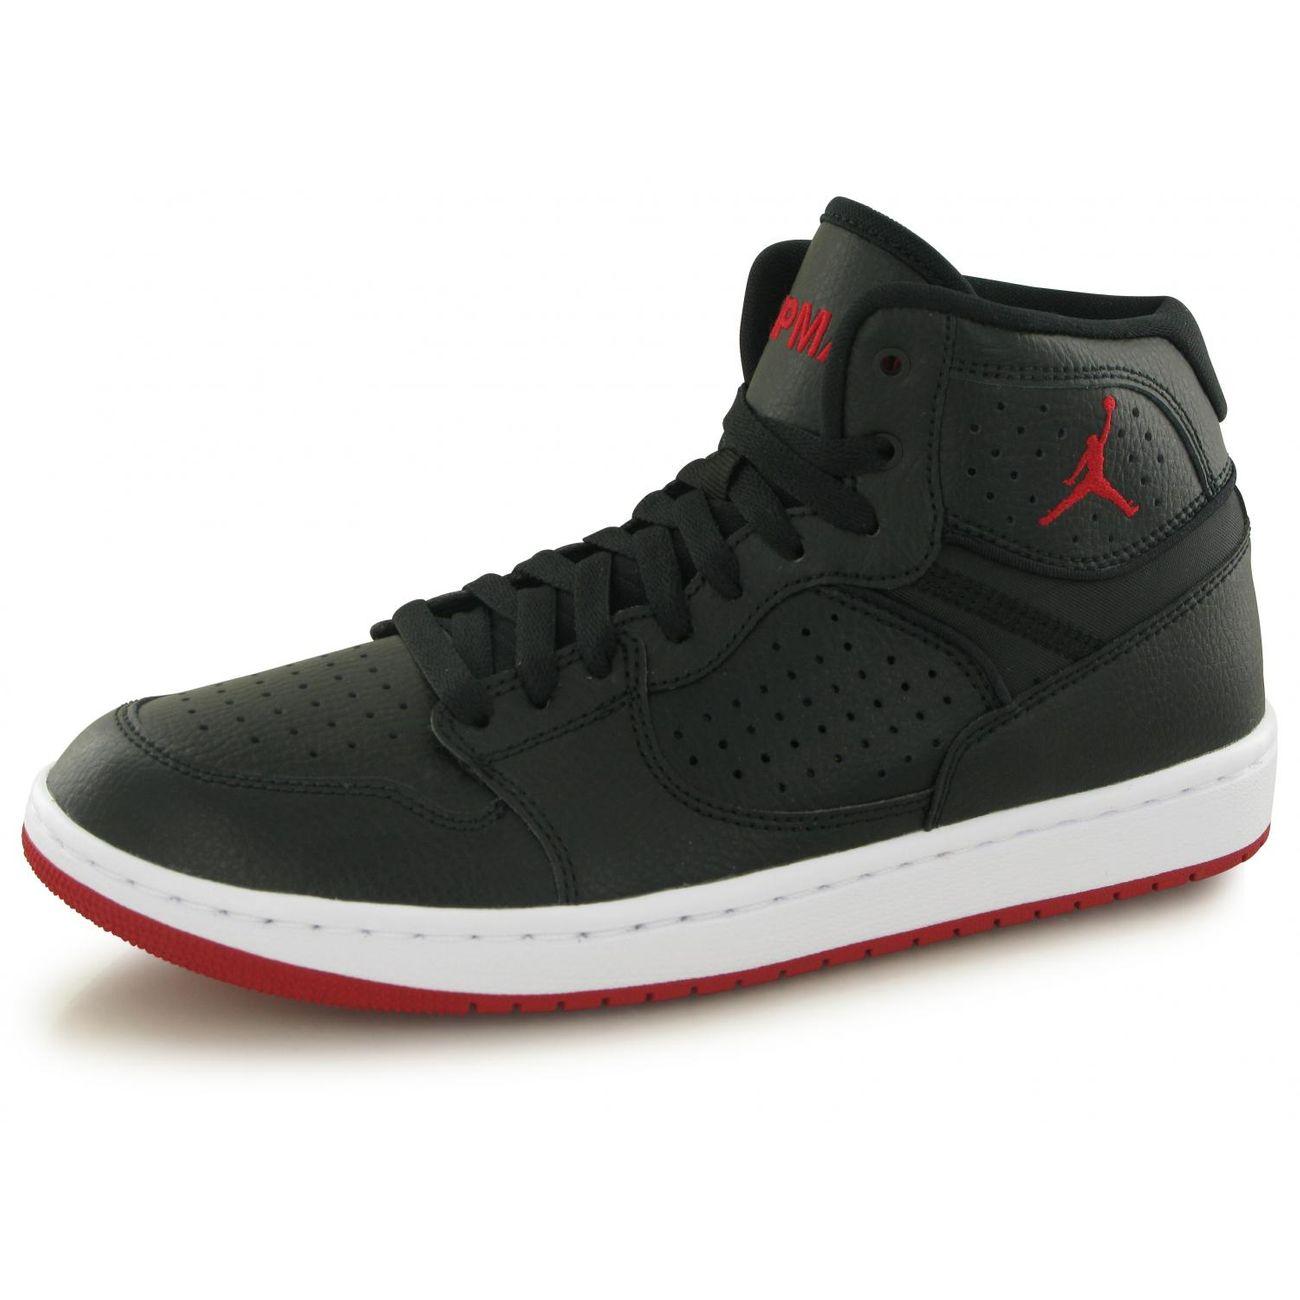 Jordan Homme Nike Access Chaussures Basket Ball D2IYW9beEH